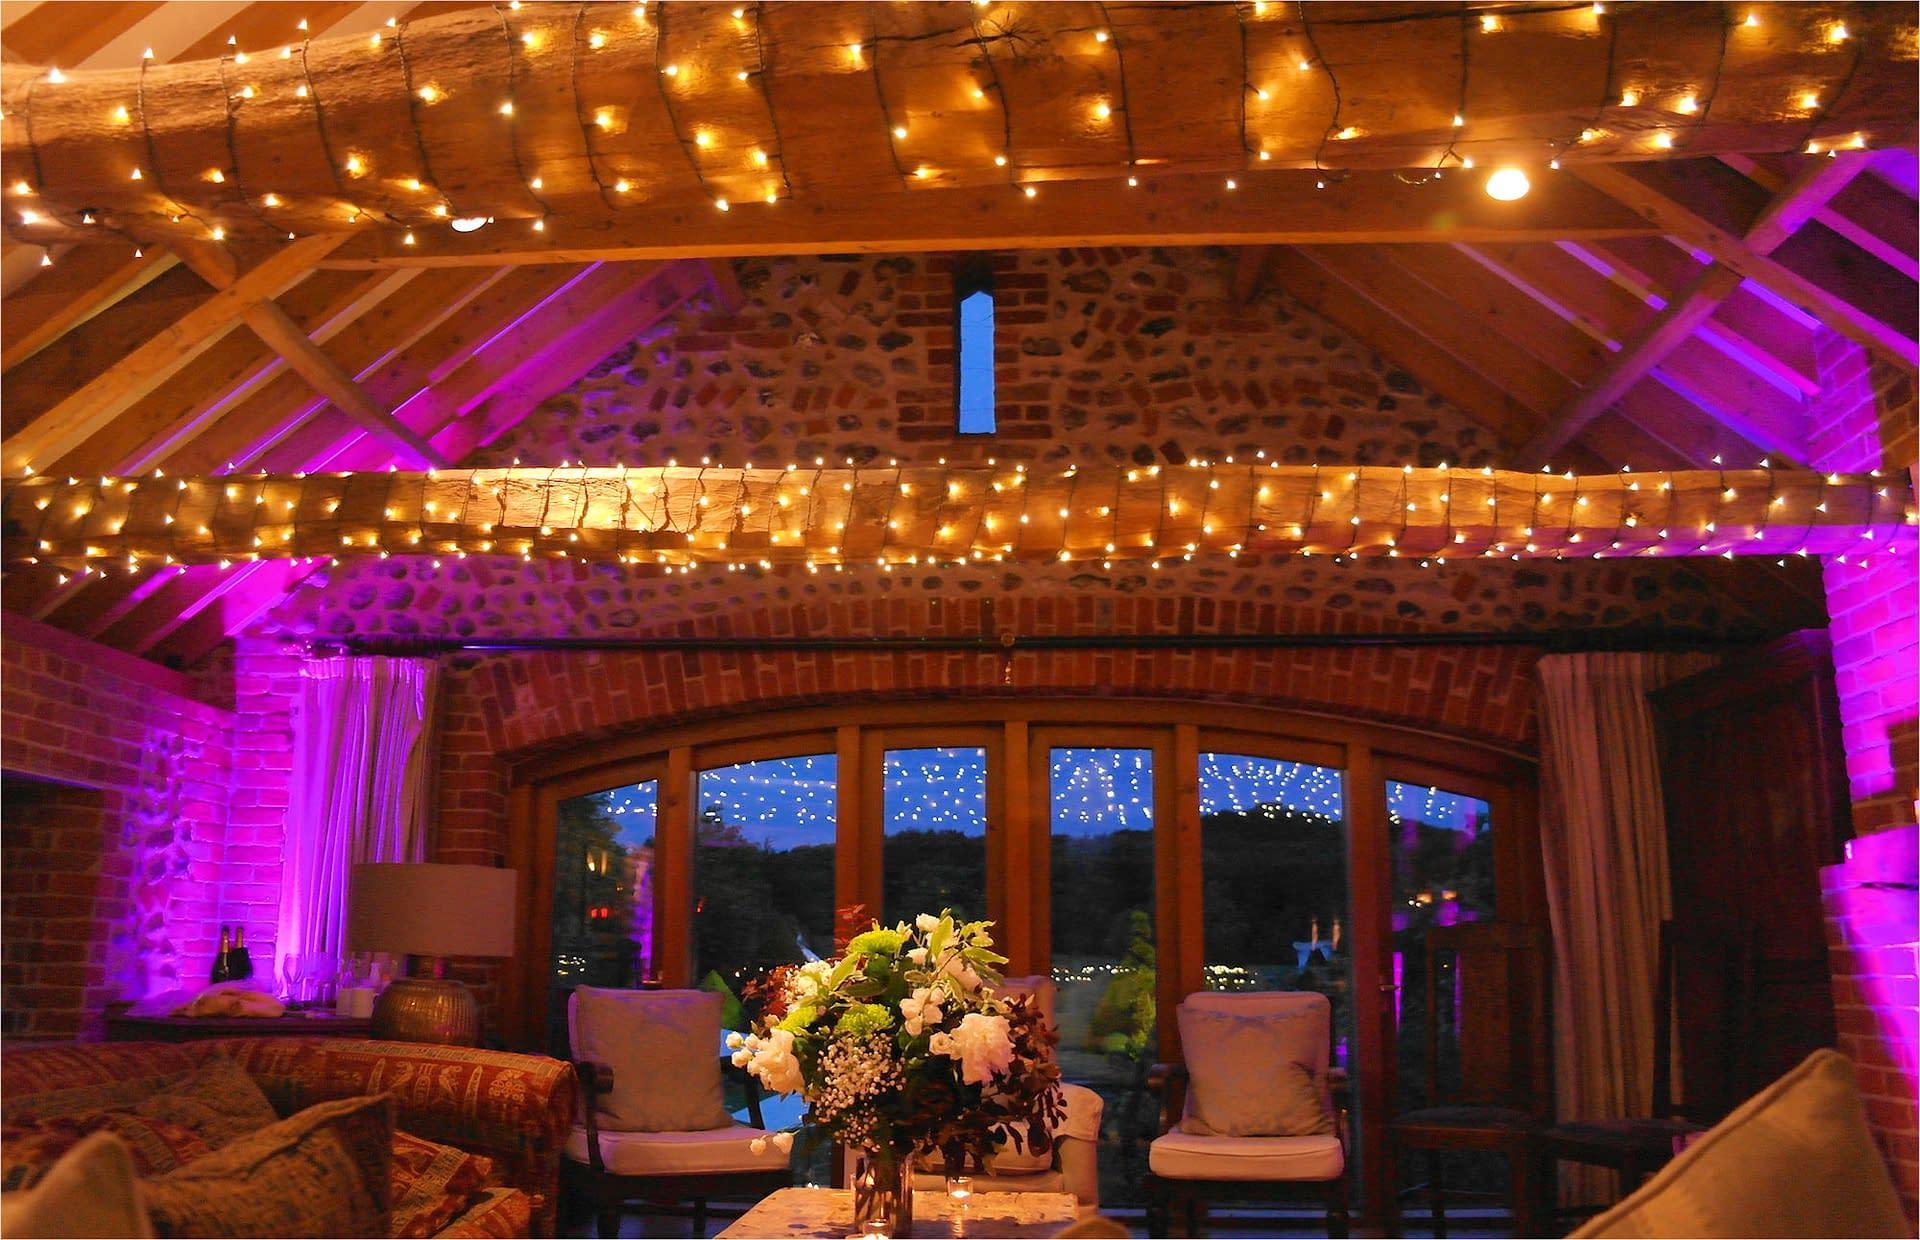 Fairy light decoration and mood lighting at Chaucer Barn, UK wedding venue